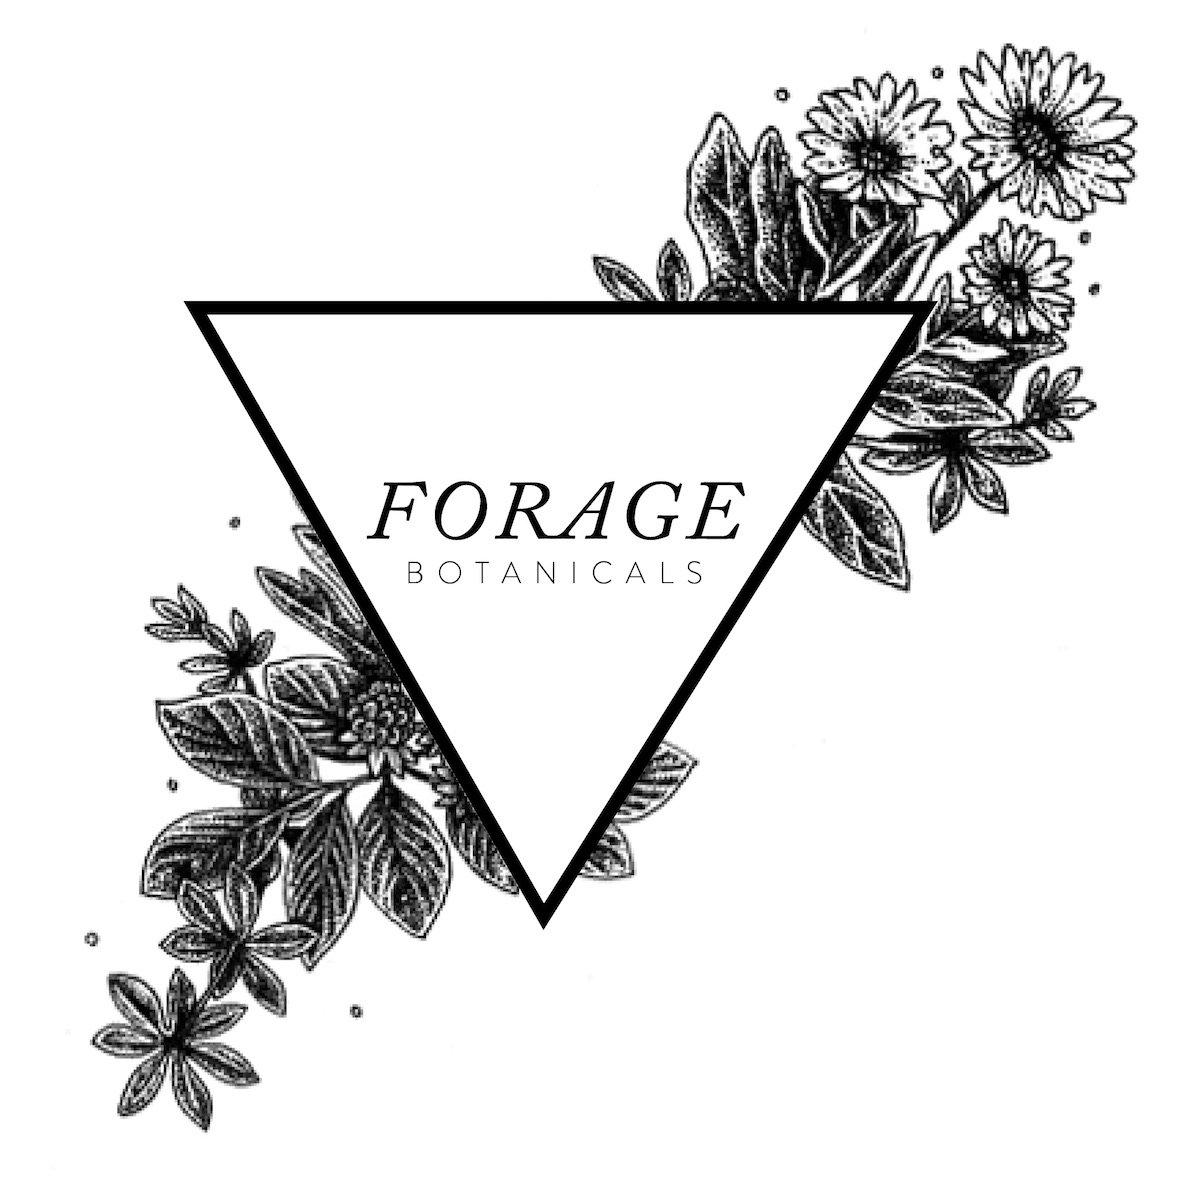 Forage Botanicals: Review